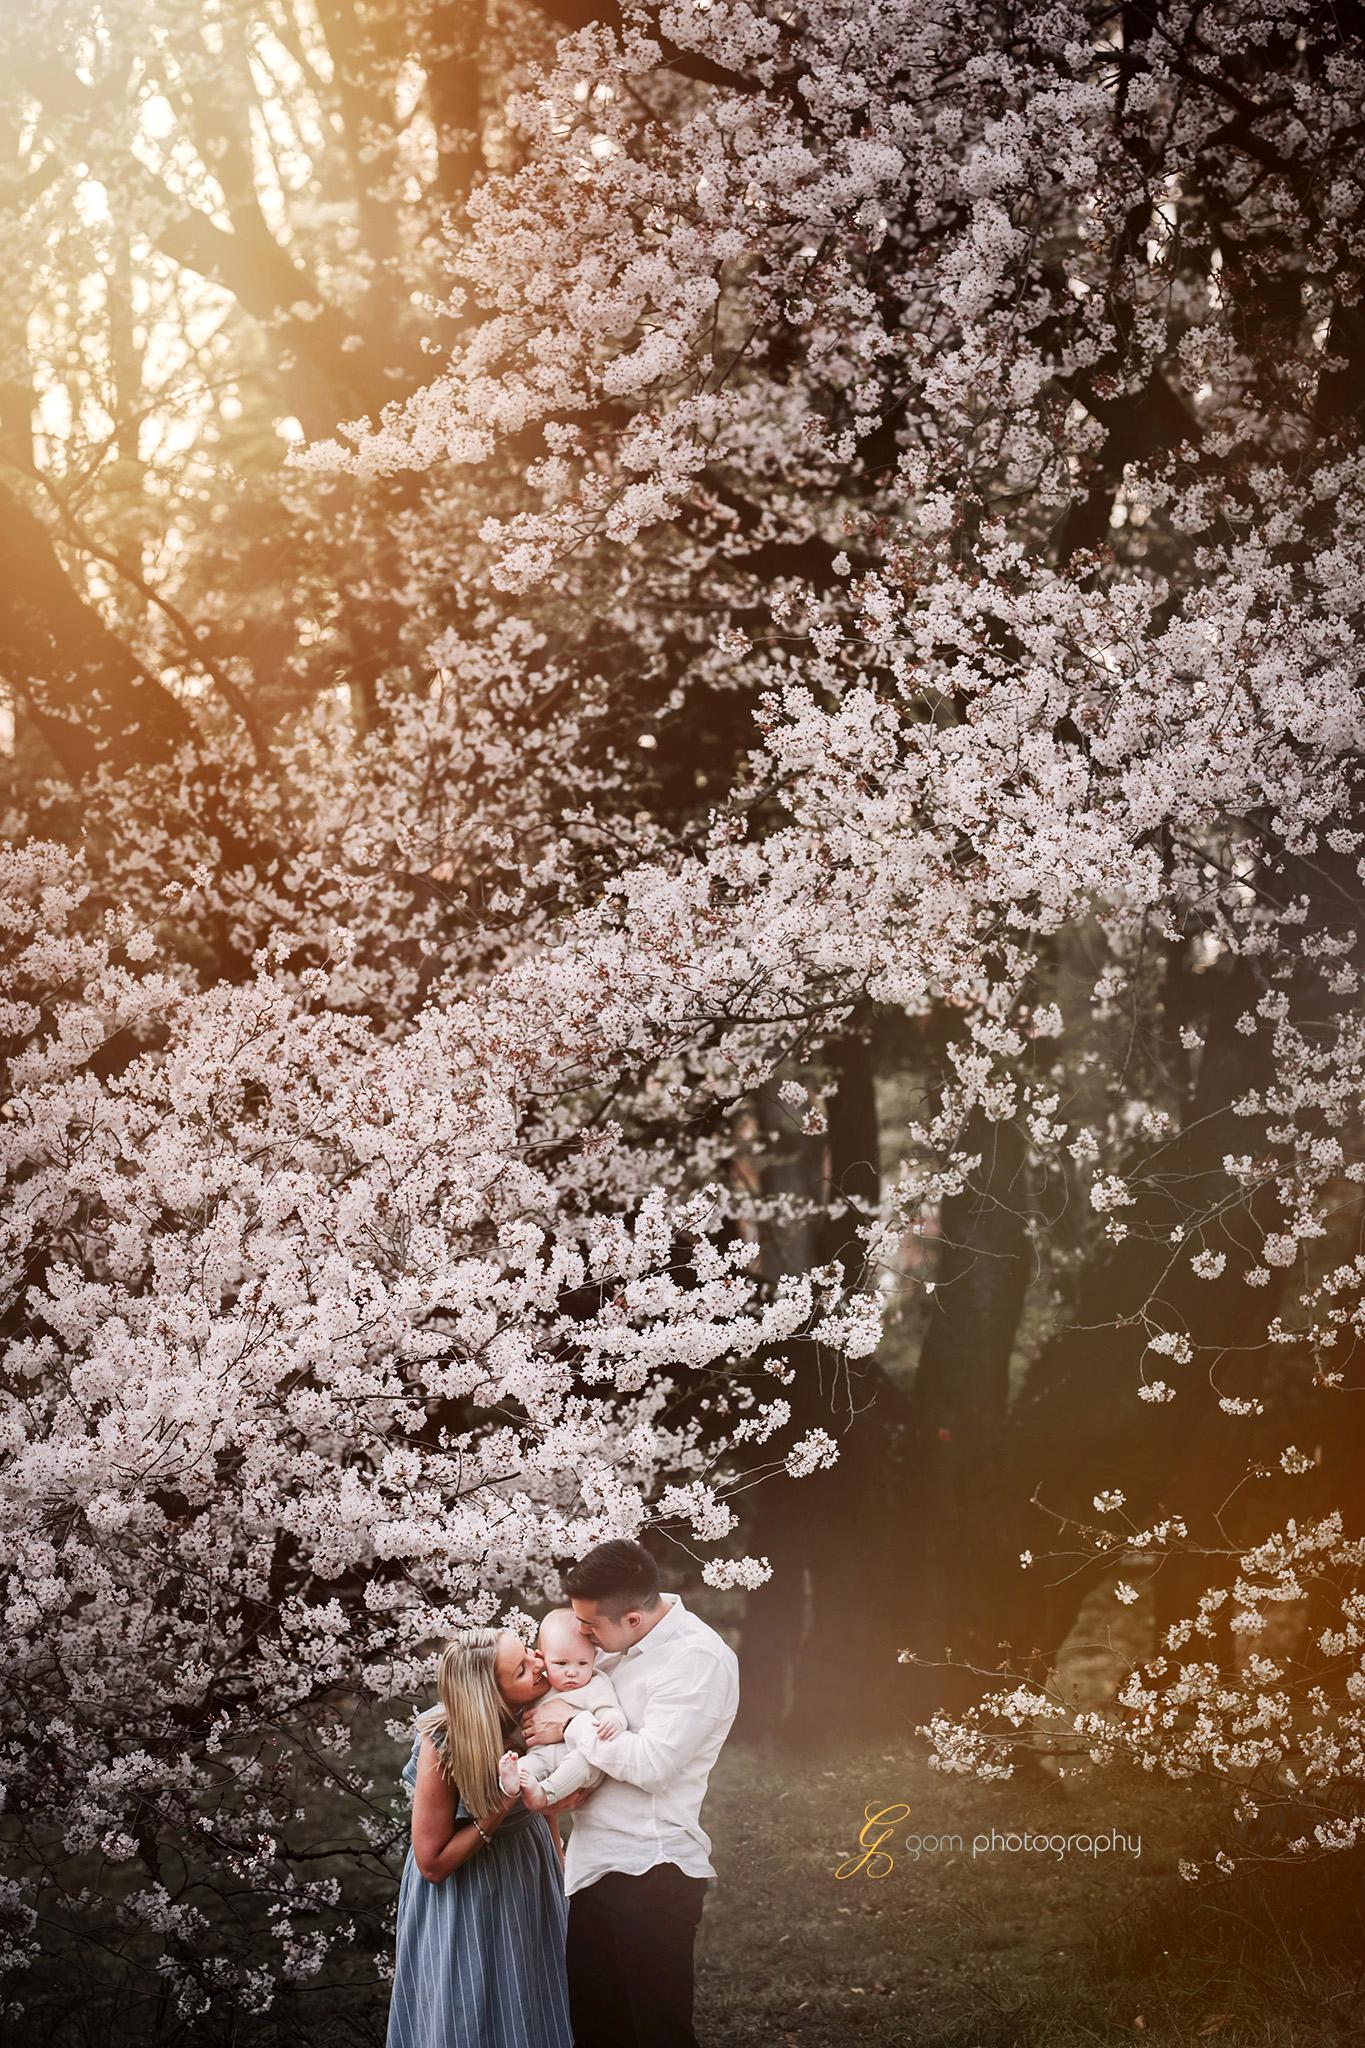 tokyo_photographer_cherry_blossom 4